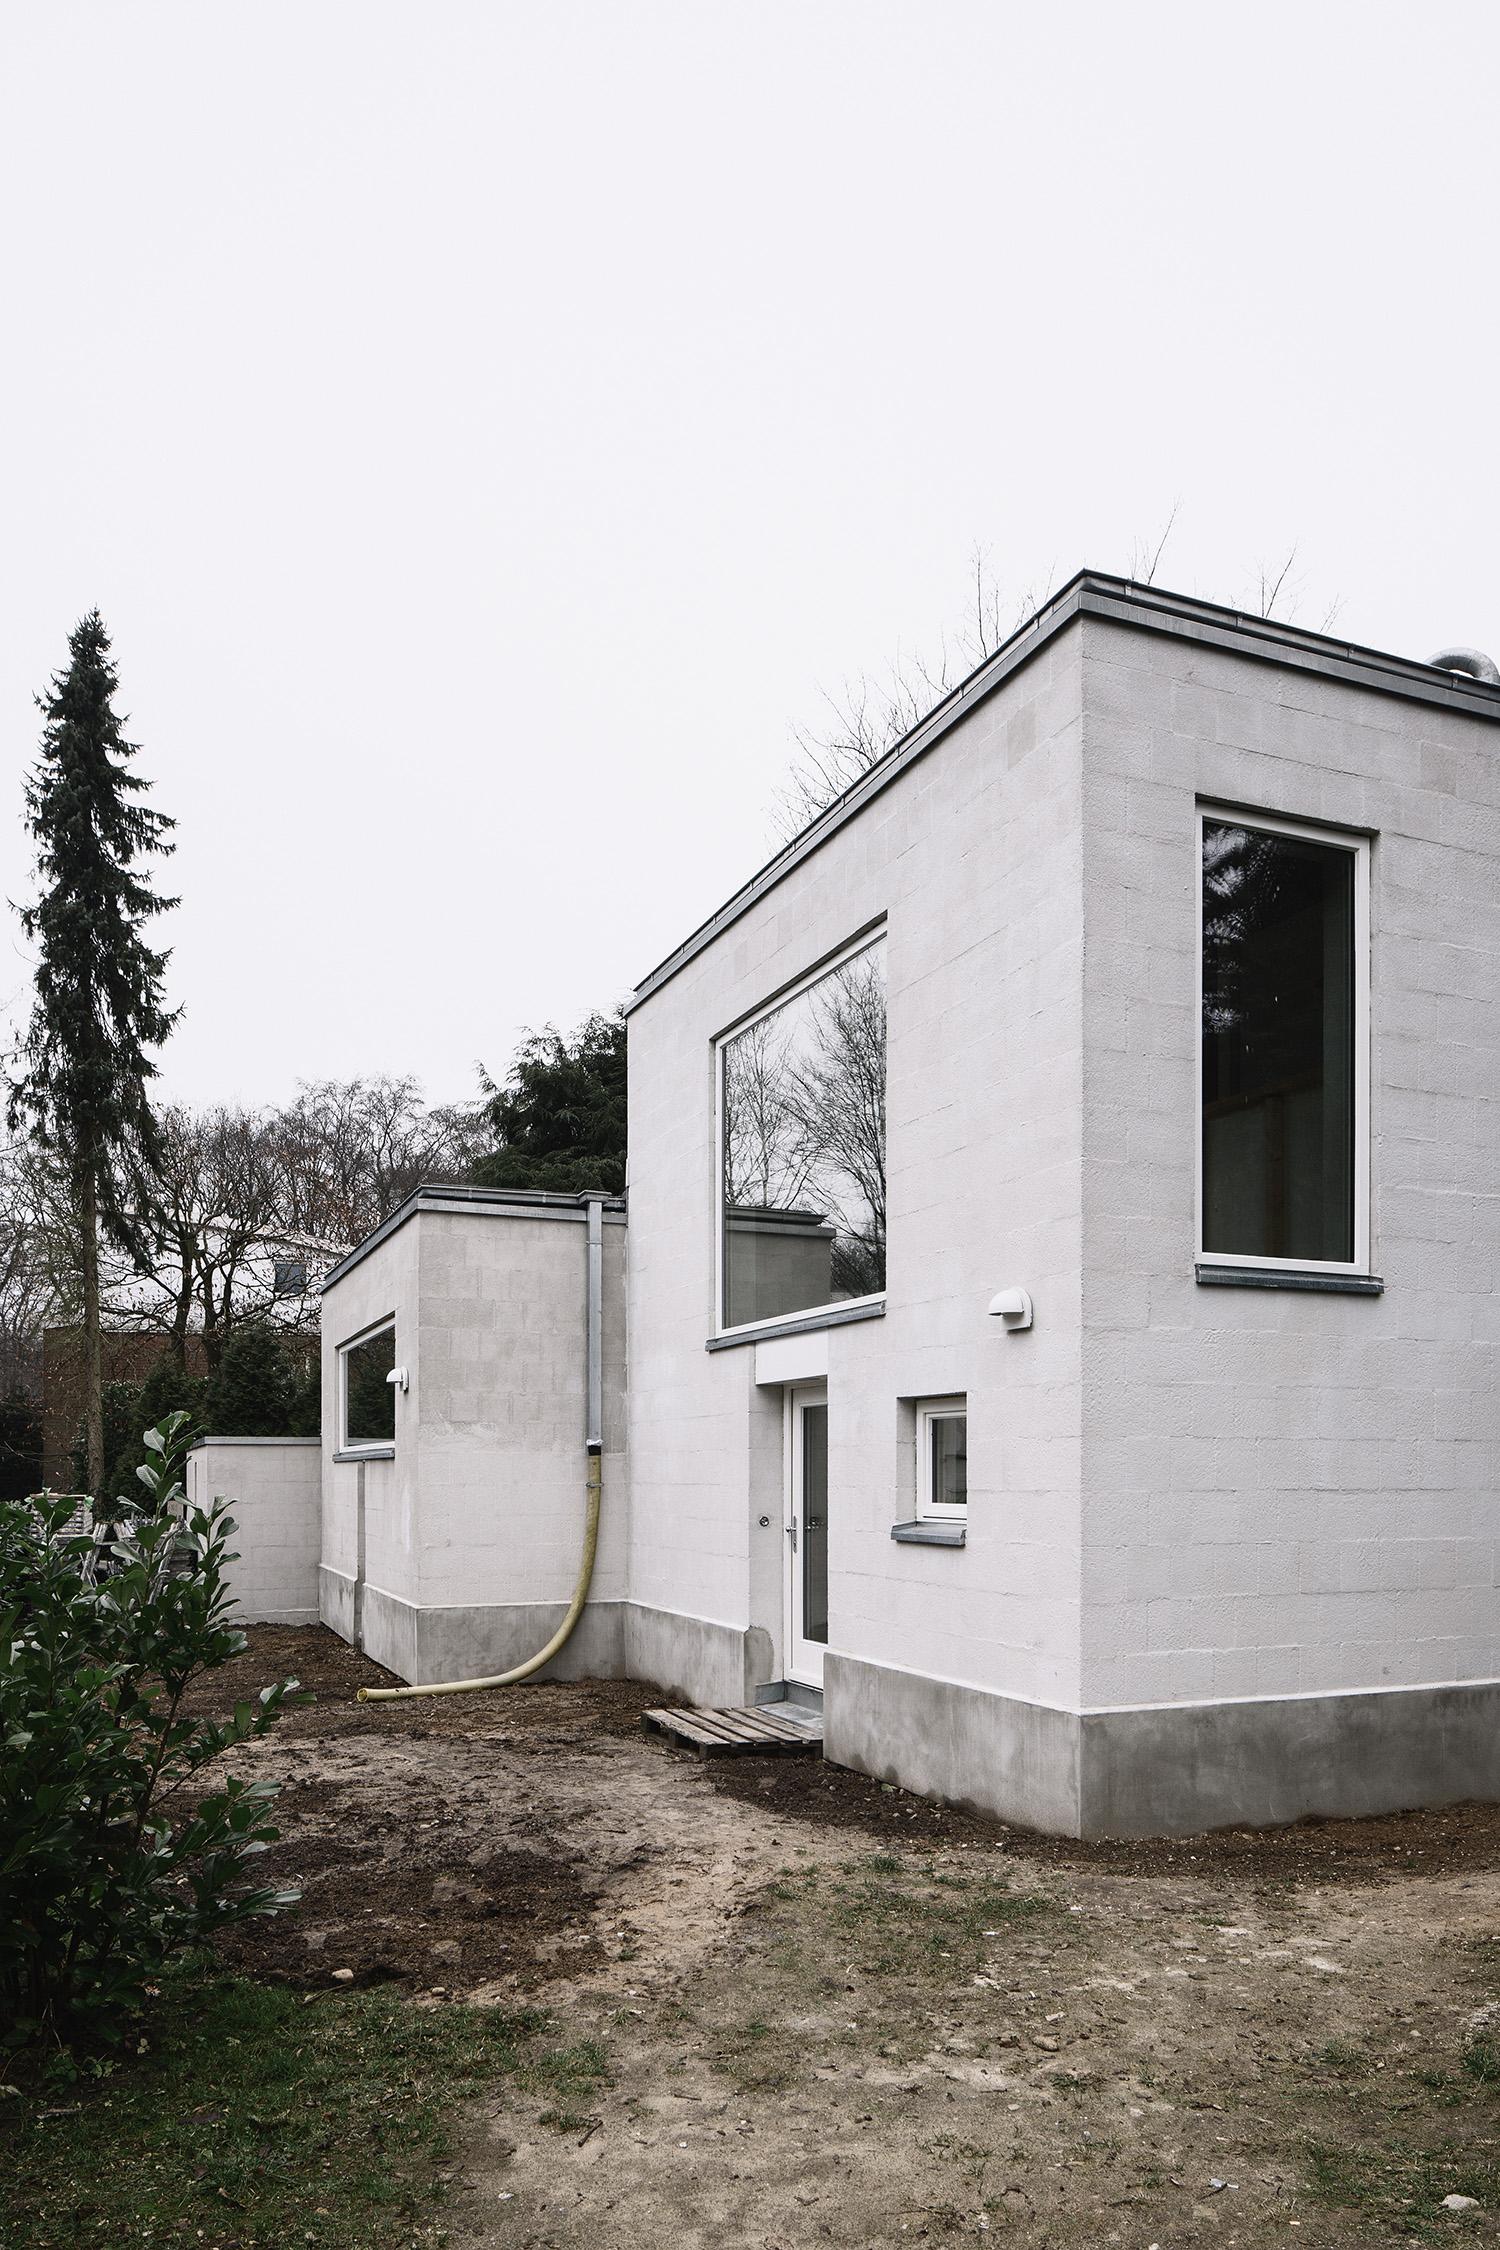 Architekt Hamburg nalleweg architekten hamburg construction philipp